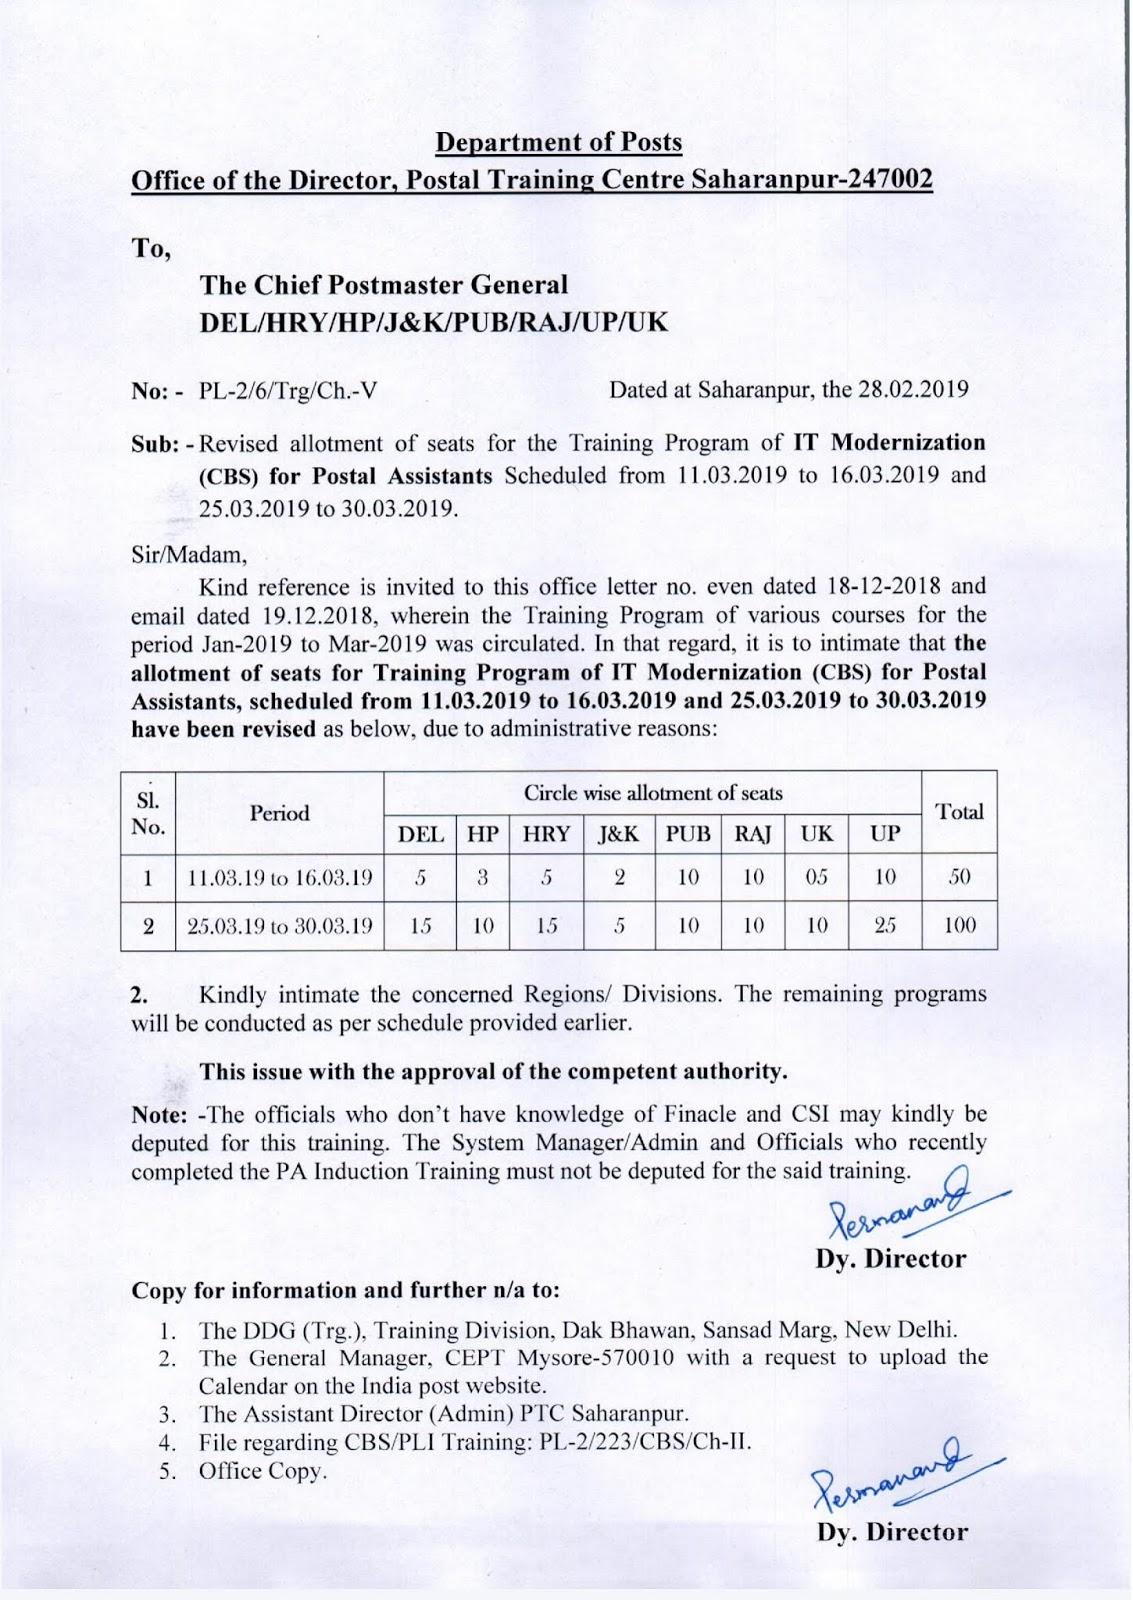 Postal Training Centre, Saharanpur : Revised allotment of